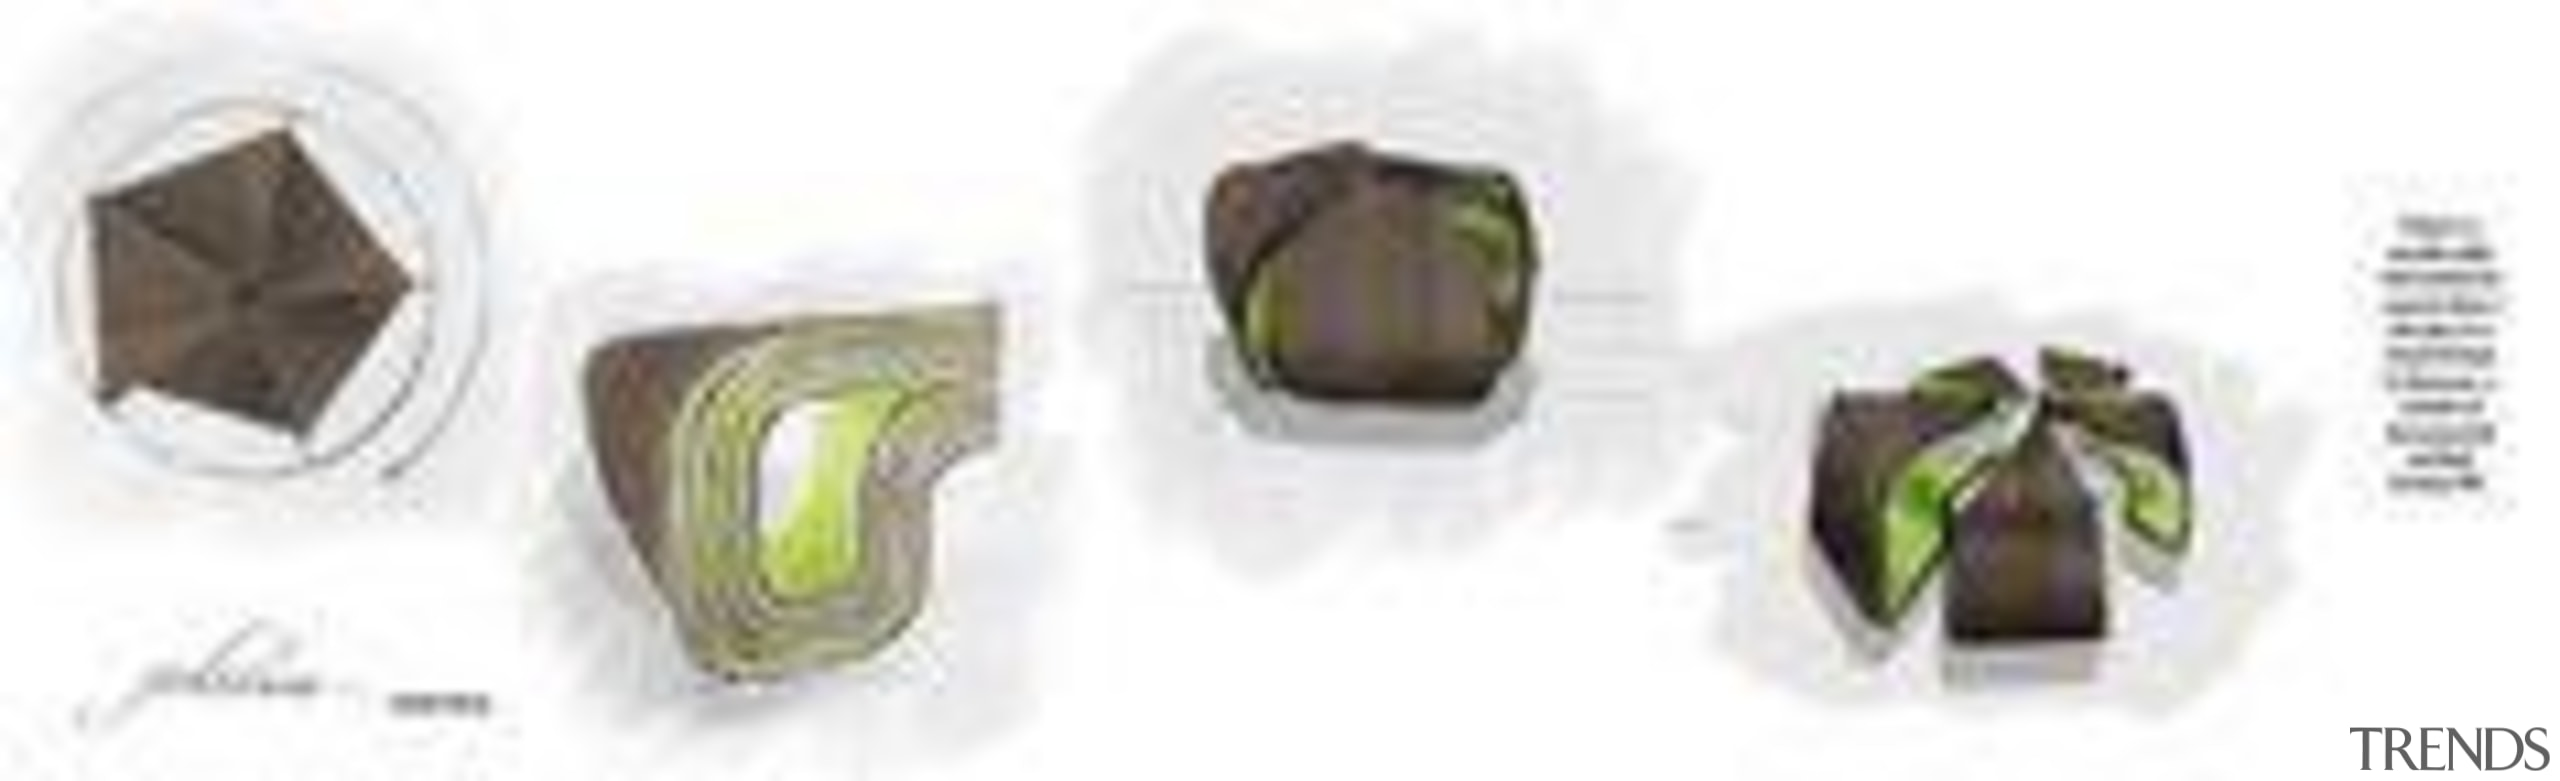 by Sophie Alsop - Folium - fashion accessory fashion accessory, product, product design, shoe, white